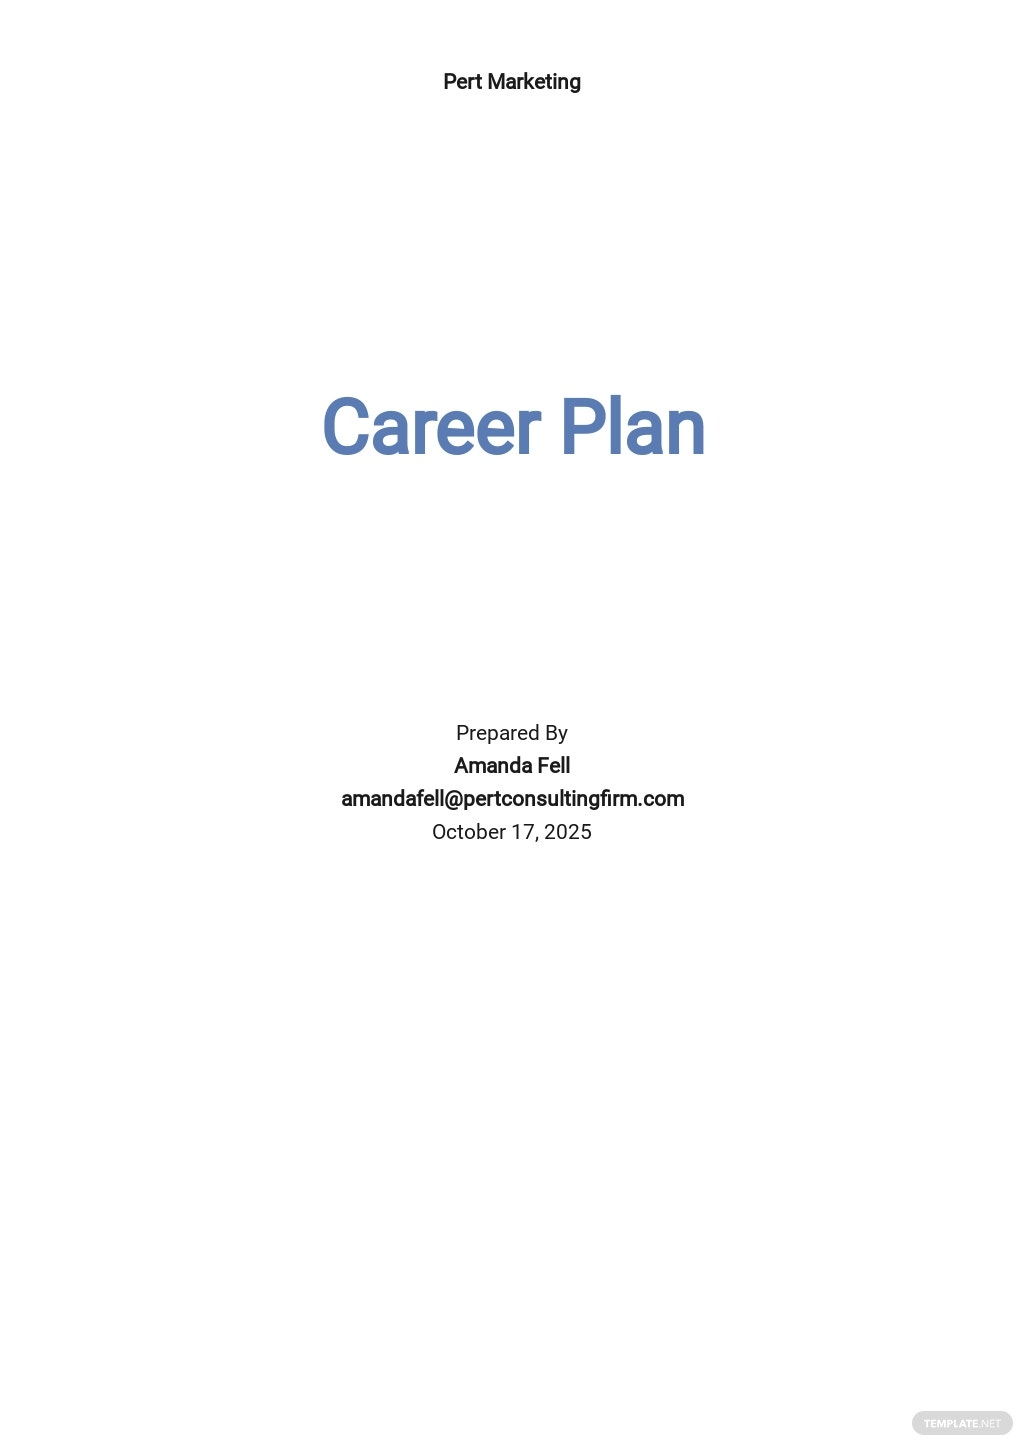 Career Plan Template